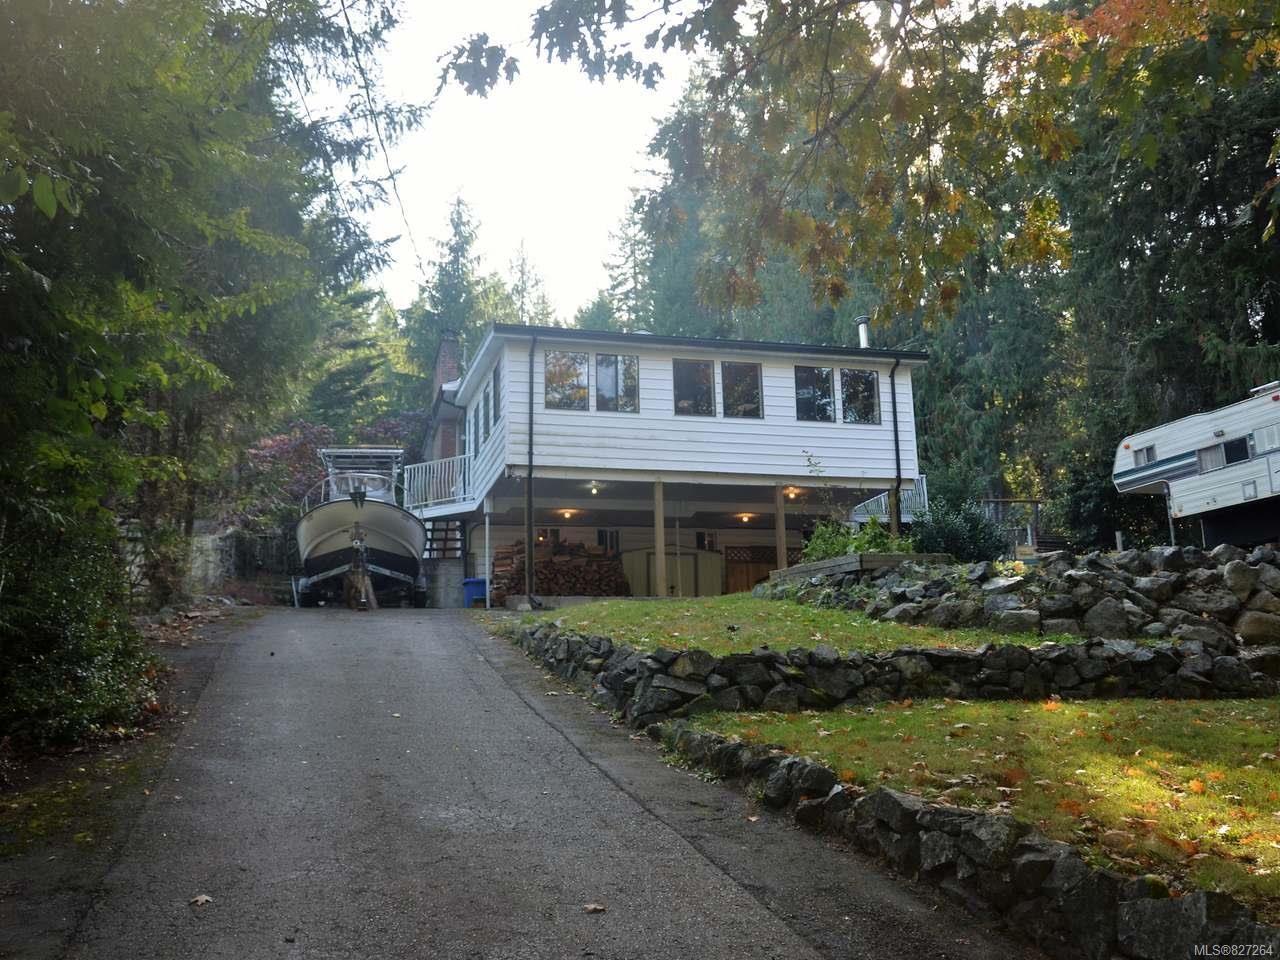 Main Photo: 2760 W Shawnigan Lake Rd in SHAWNIGAN LAKE: ML Shawnigan House for sale (Malahat & Area)  : MLS®# 827264